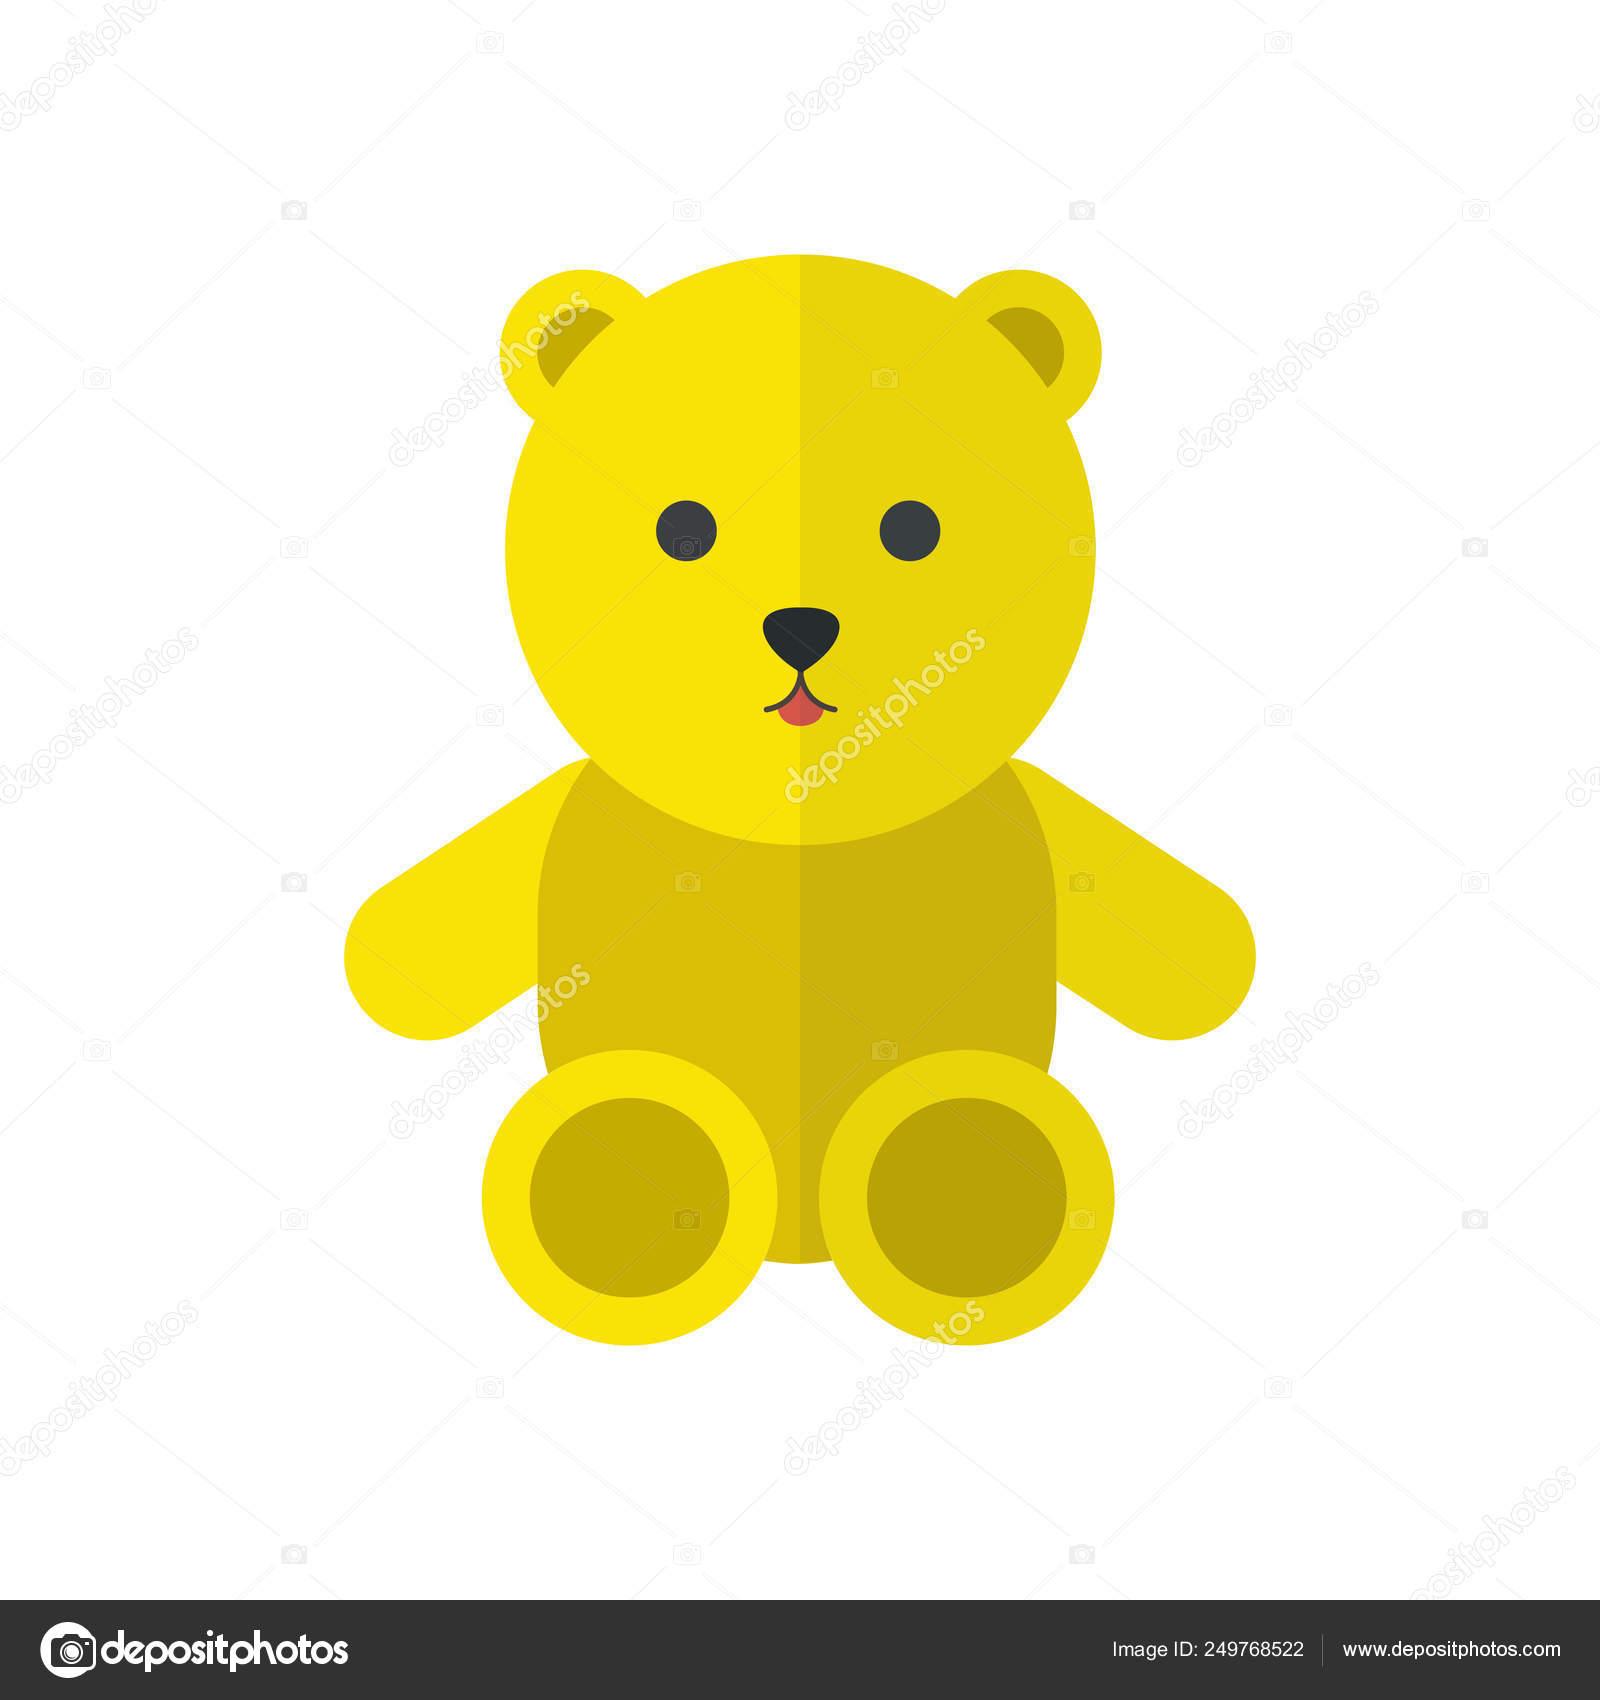 Icone De Vetor De Urso De Pelucia Vetor De Stock C Pani Chernous